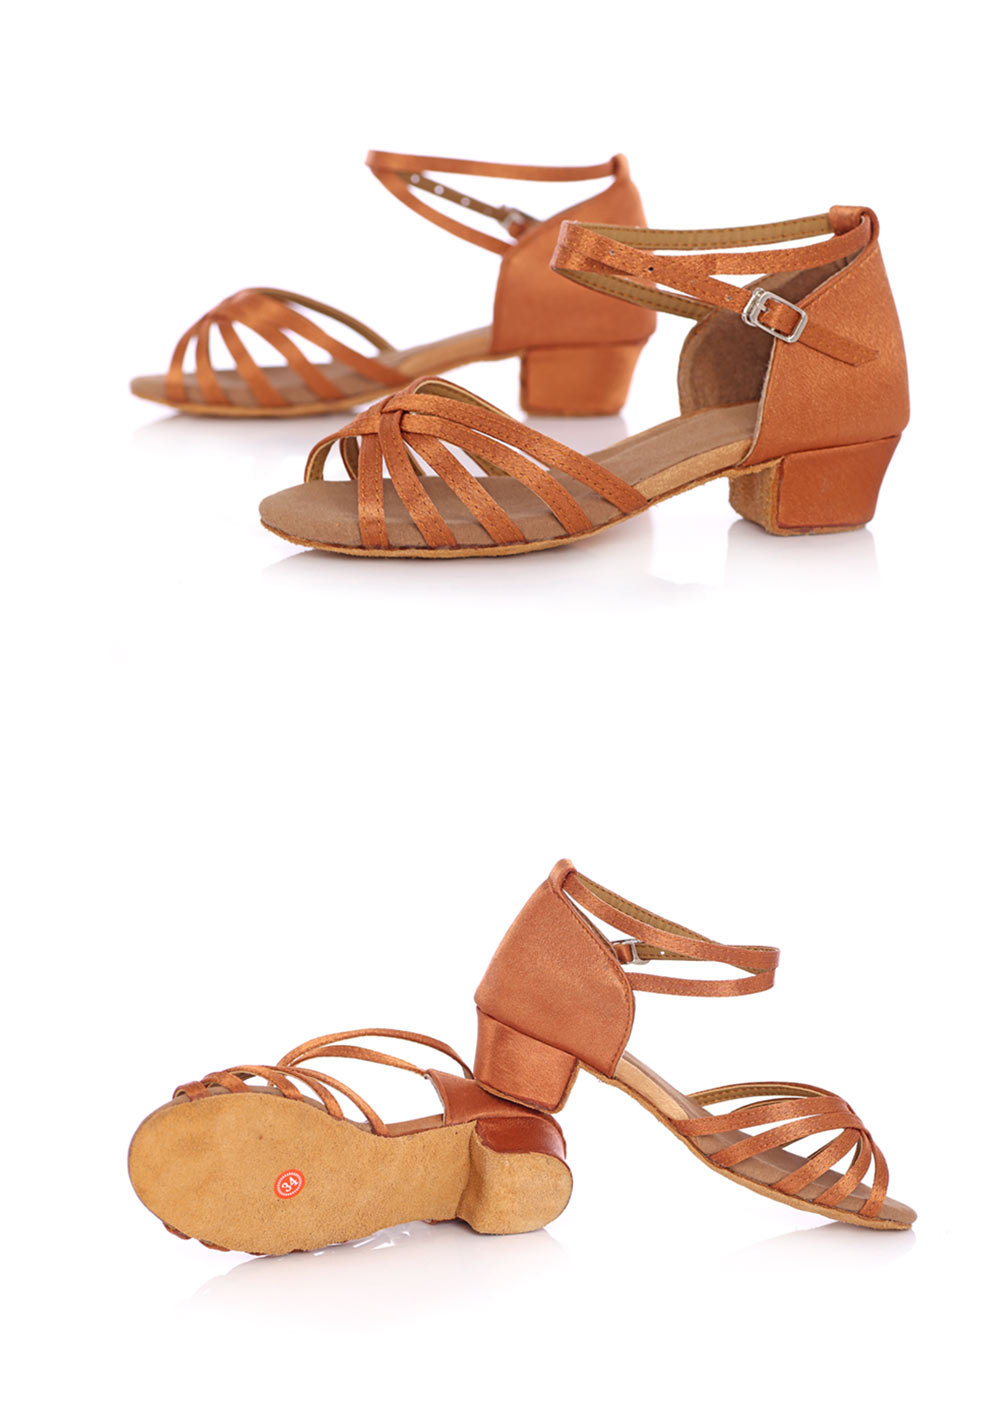 New Arrival Ballroom Tango Latin Dance Shoes High Quality Latin Woman Dancing Shoe Wholesale Women'S Heel Shoes Fast Shipping (10)